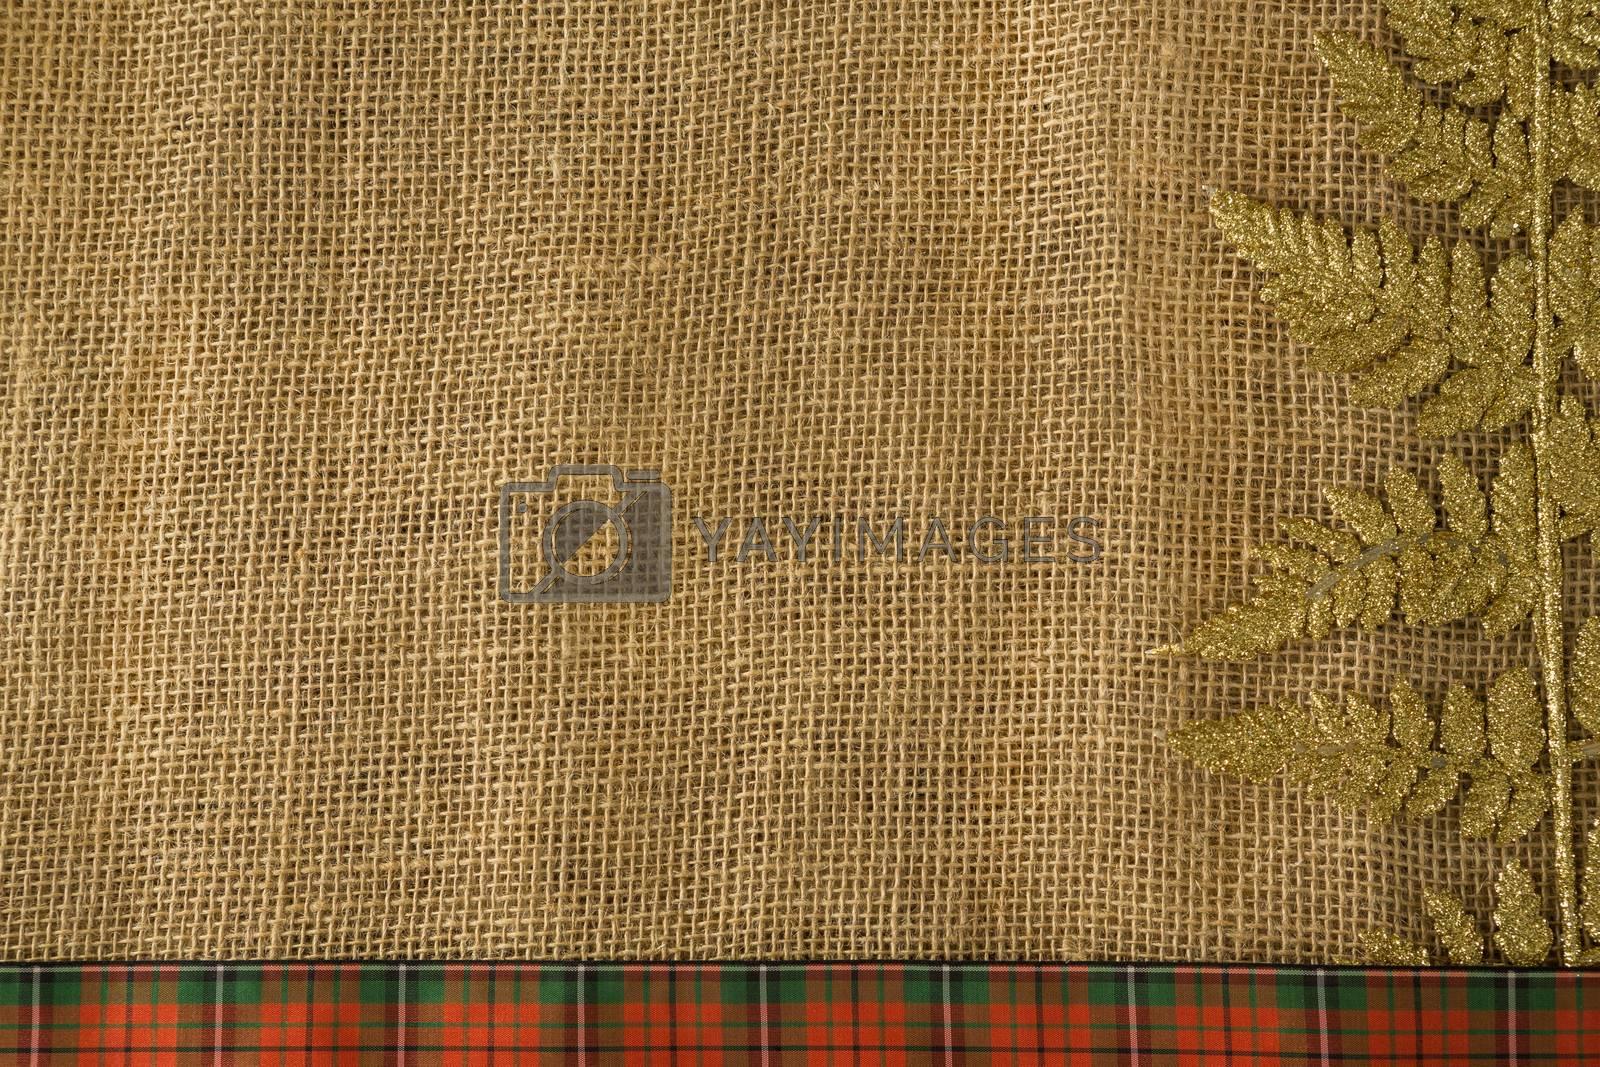 Christmas decoration on fabric by Wavebreakmedia